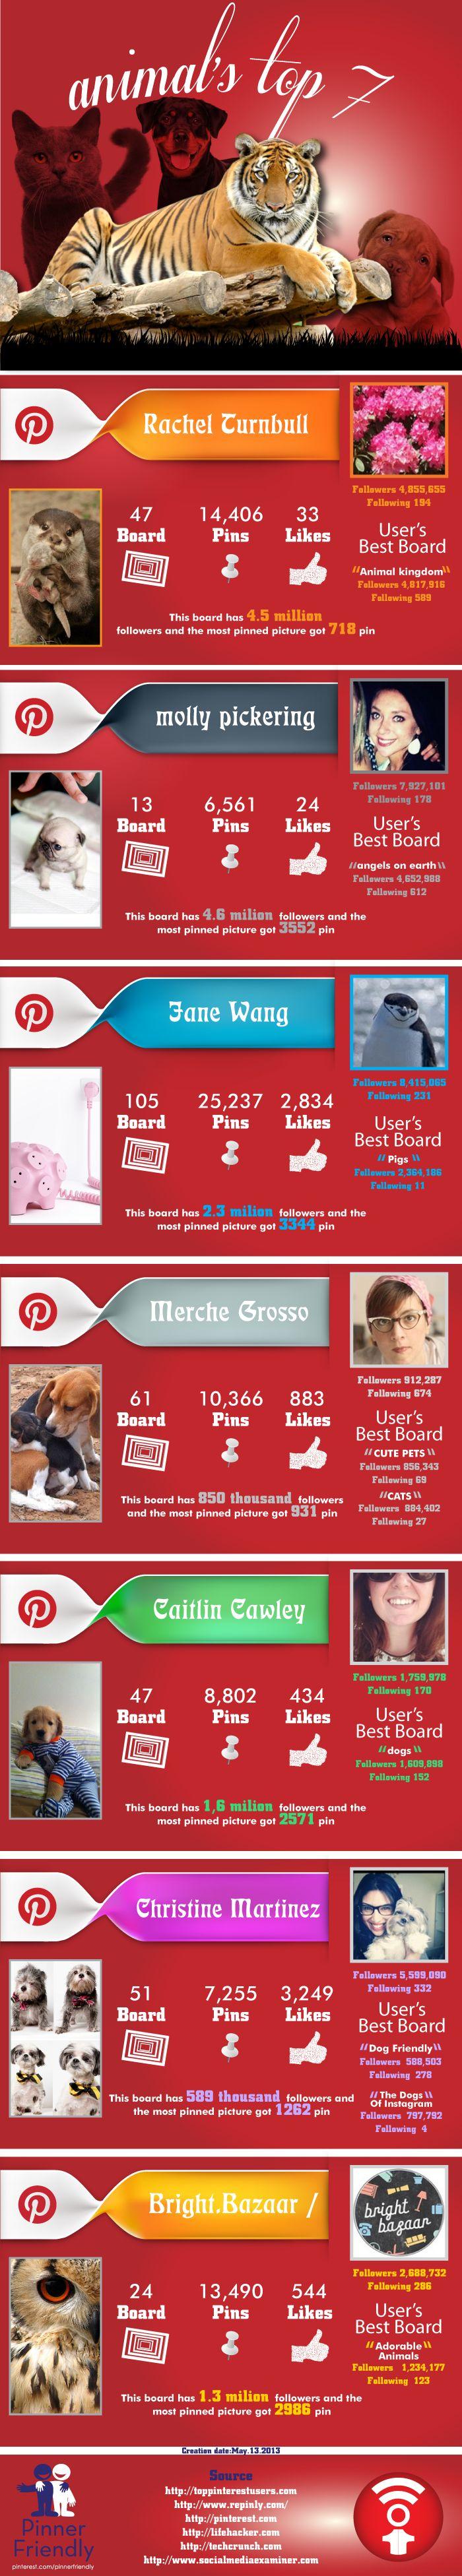 Animals Top7 Pinterest